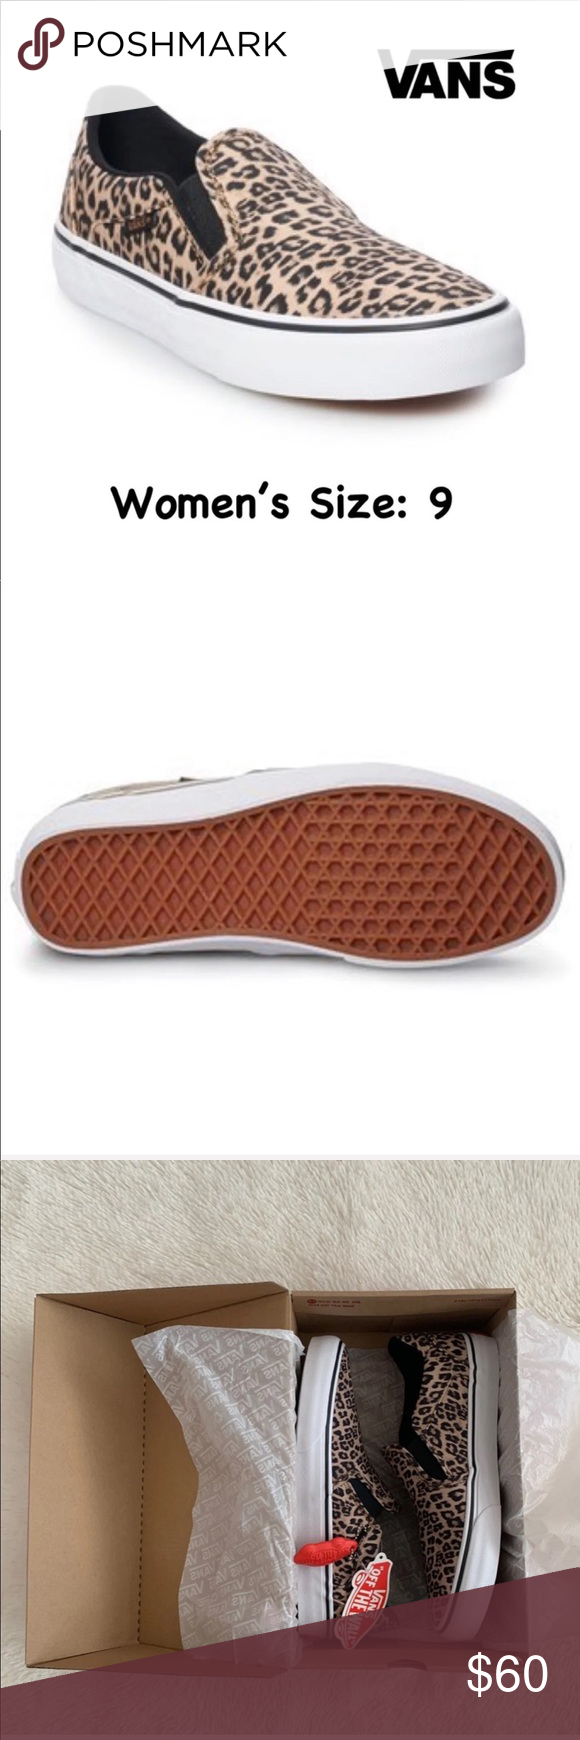 3313142c16 Vans Asher DX Women s Suede Skate Shoes